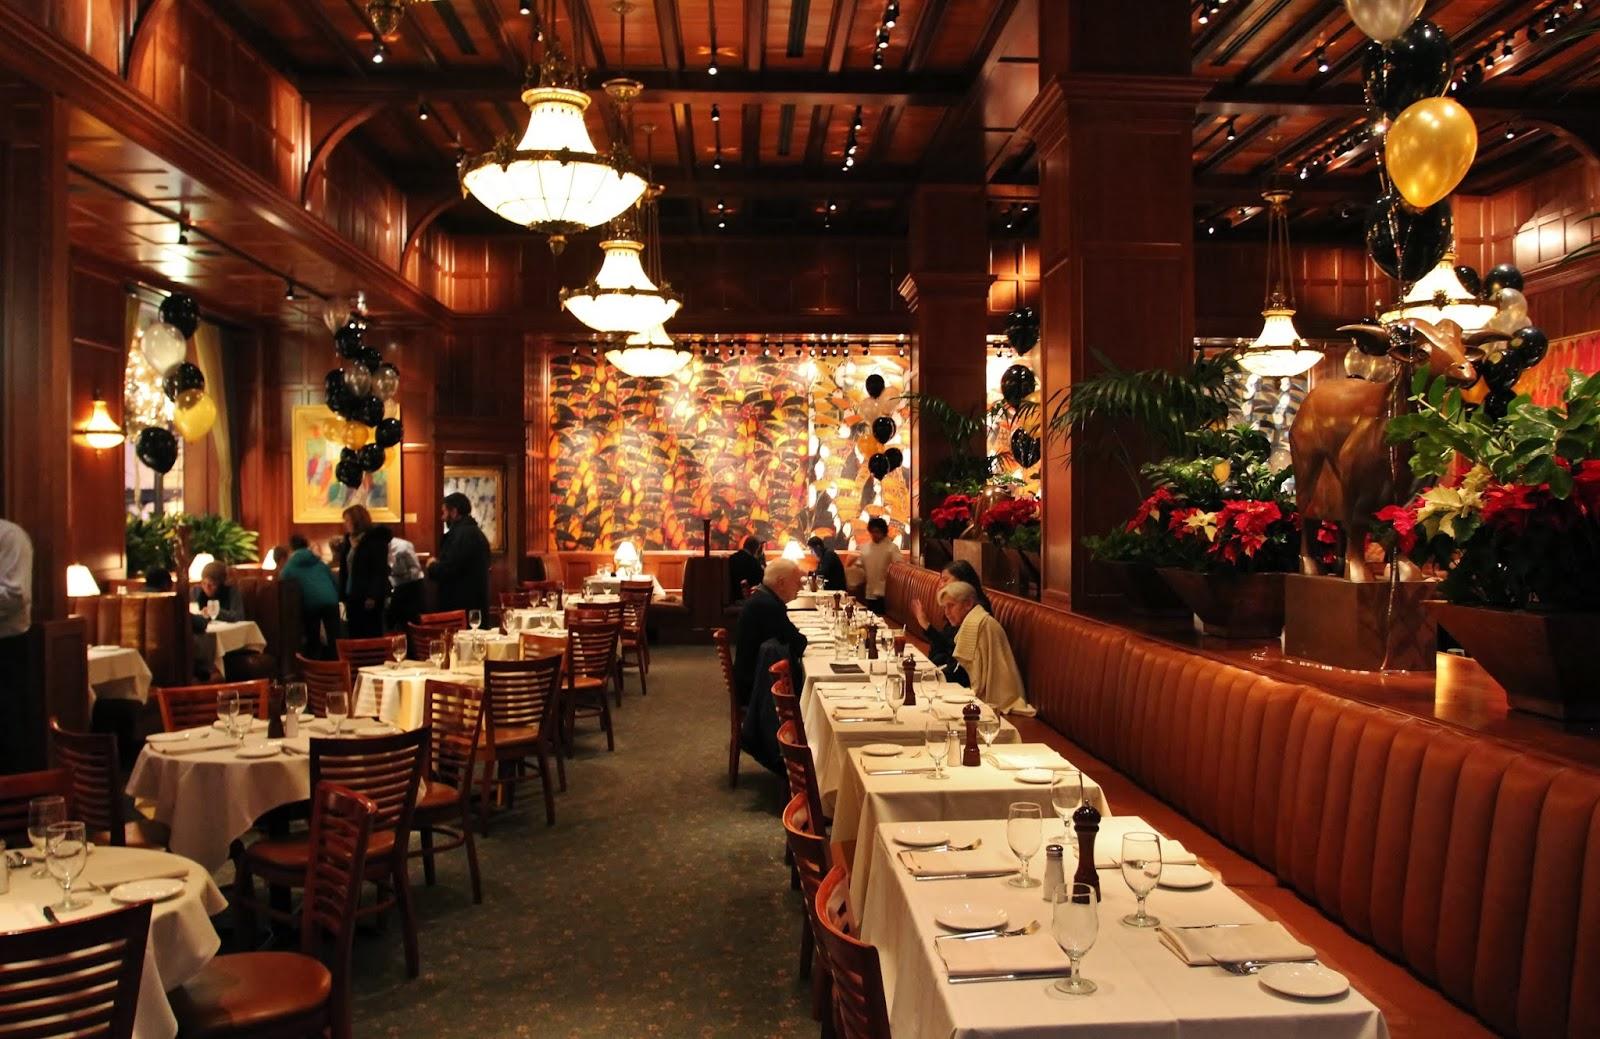 Pittsburgh owl scribe washington s restaurant scene